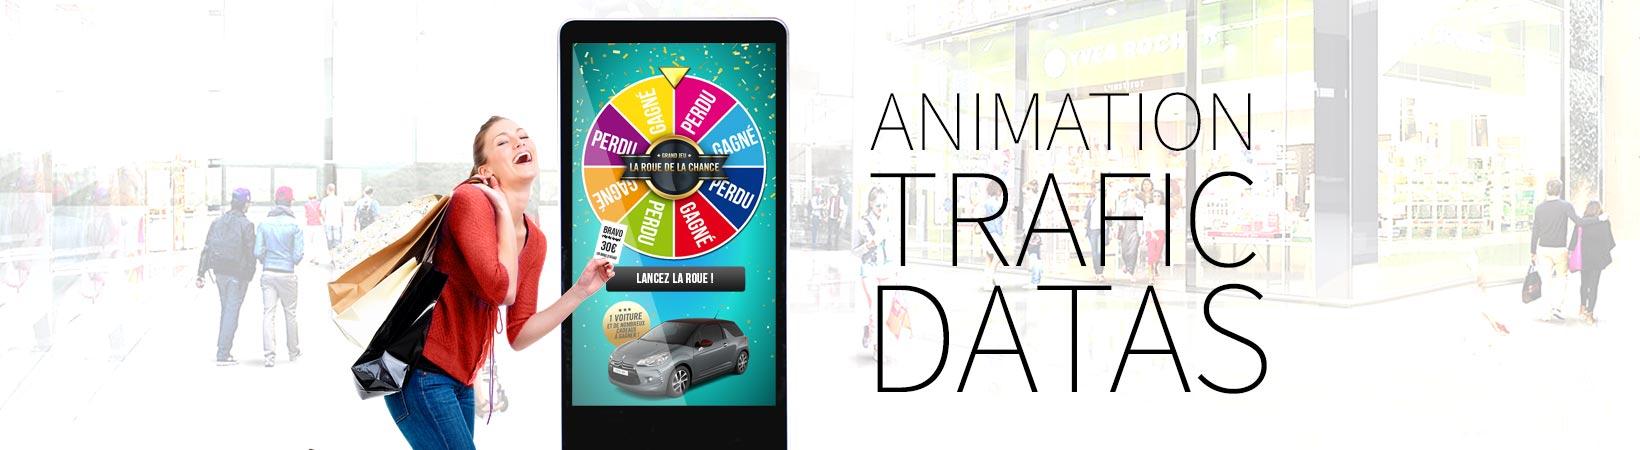 animation-trafic-data-arsenal